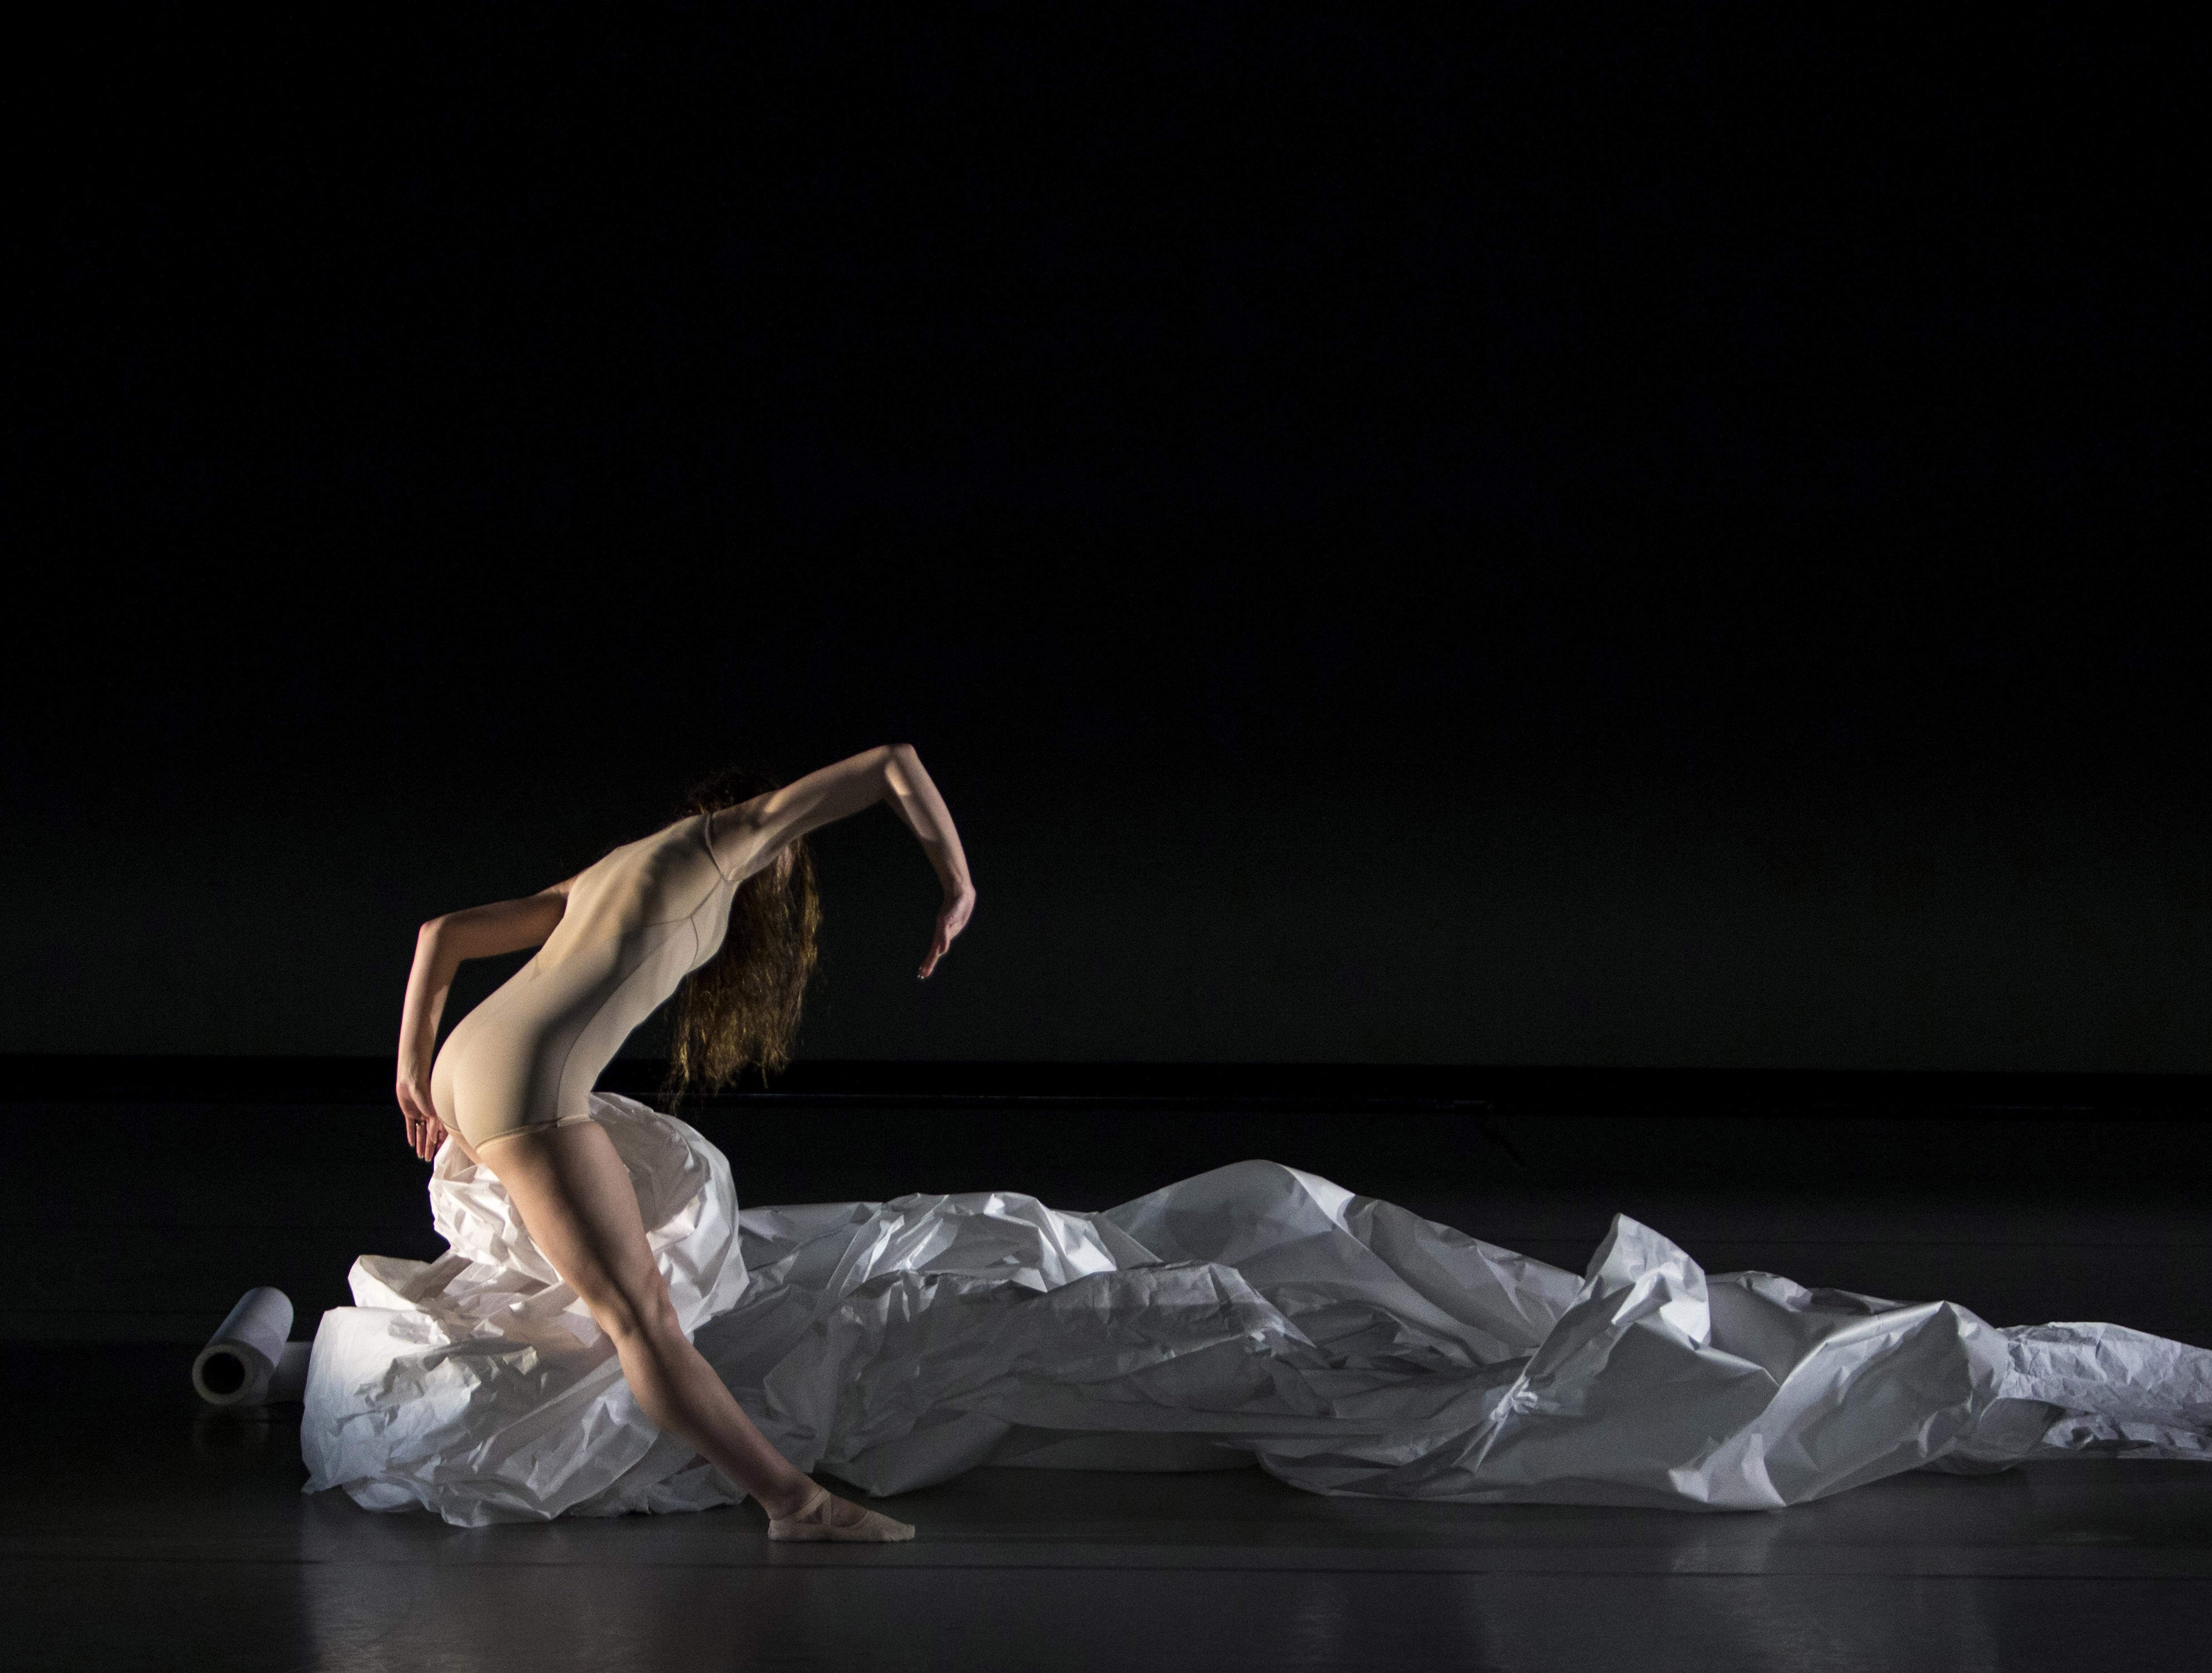 Anna Patsfall, by Meagan Helman